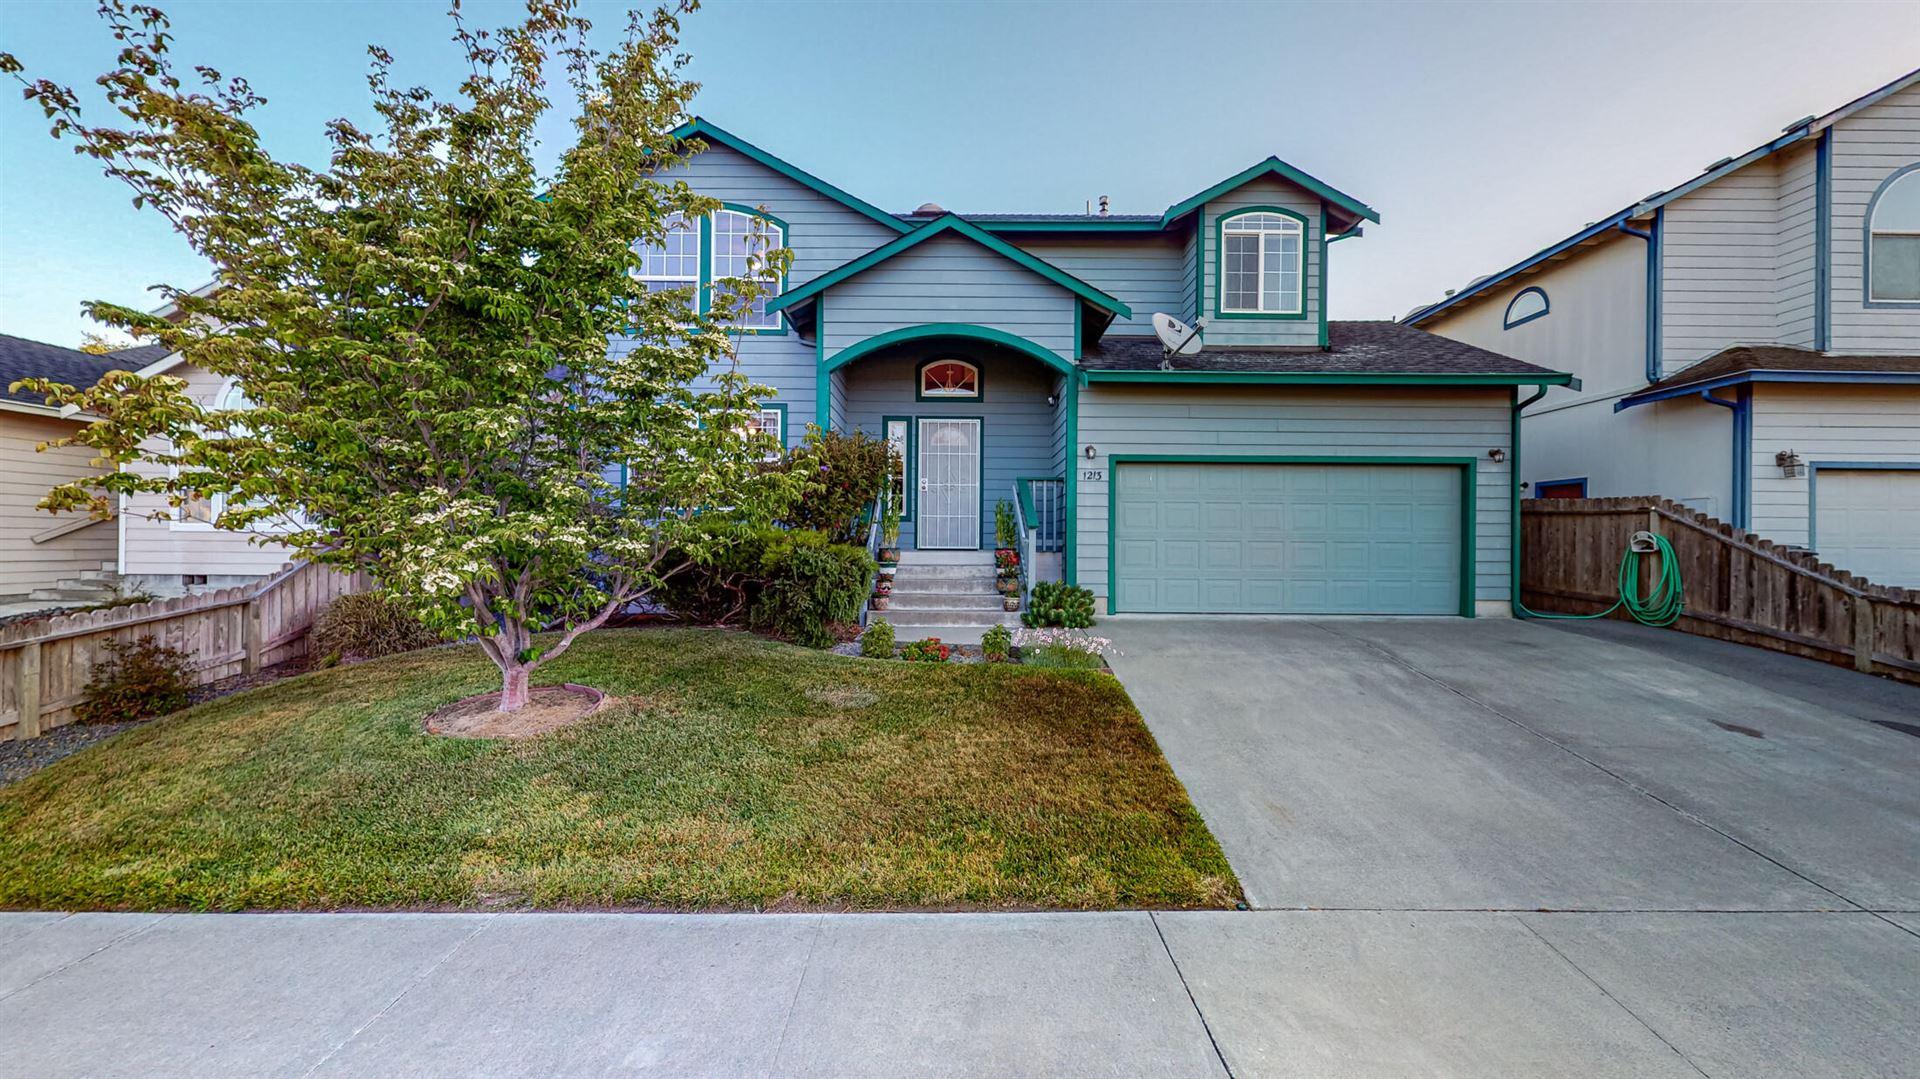 1213 Lonestar Drive, McKinleyville, CA 95519 - MLS#: 259306